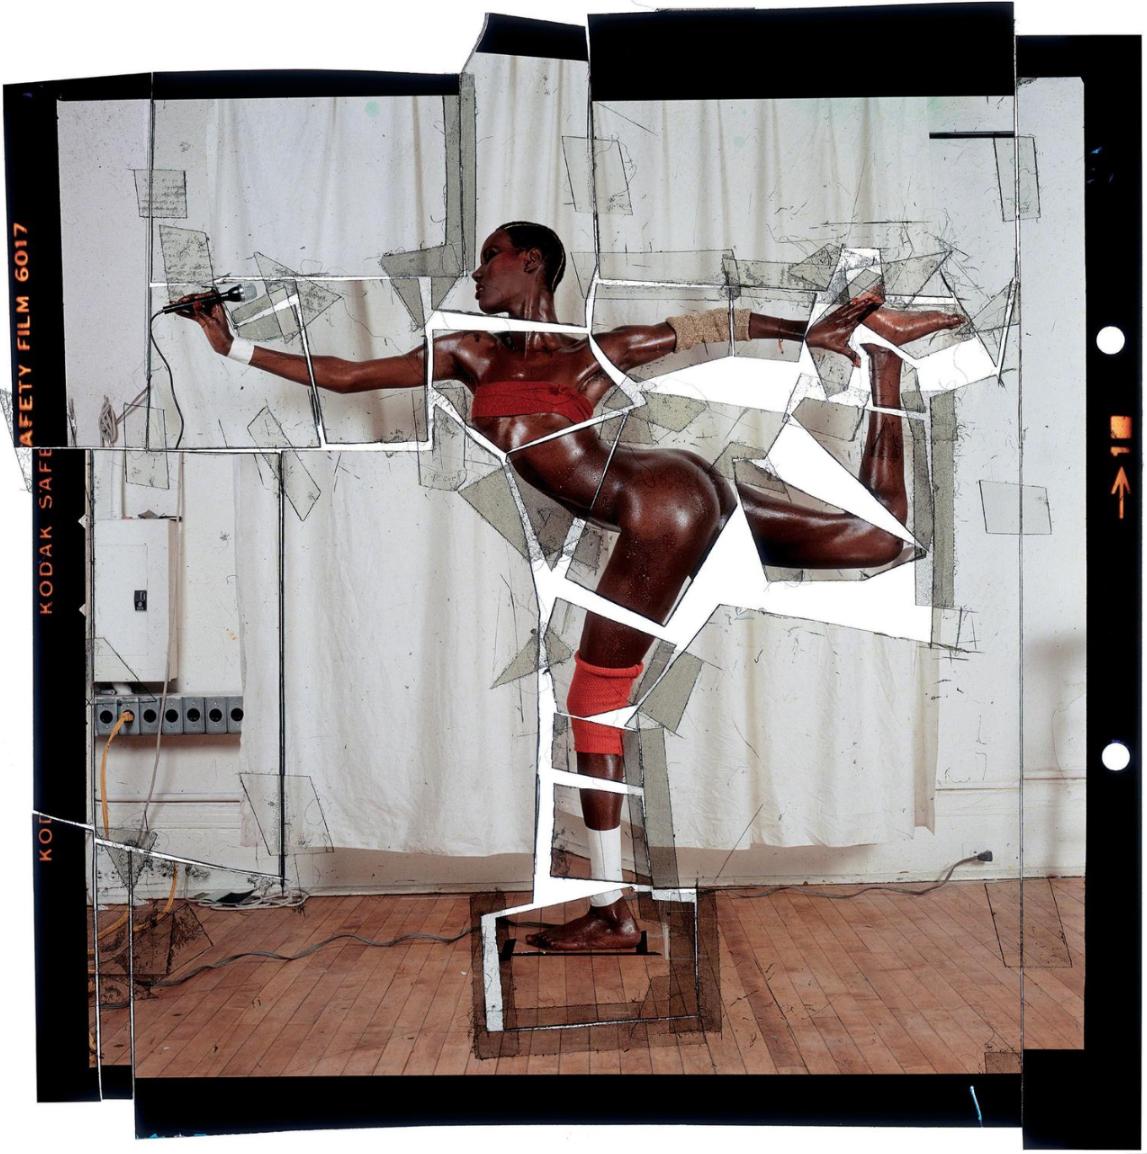 Jean Paul Goude. Toukie, New-york, 1974